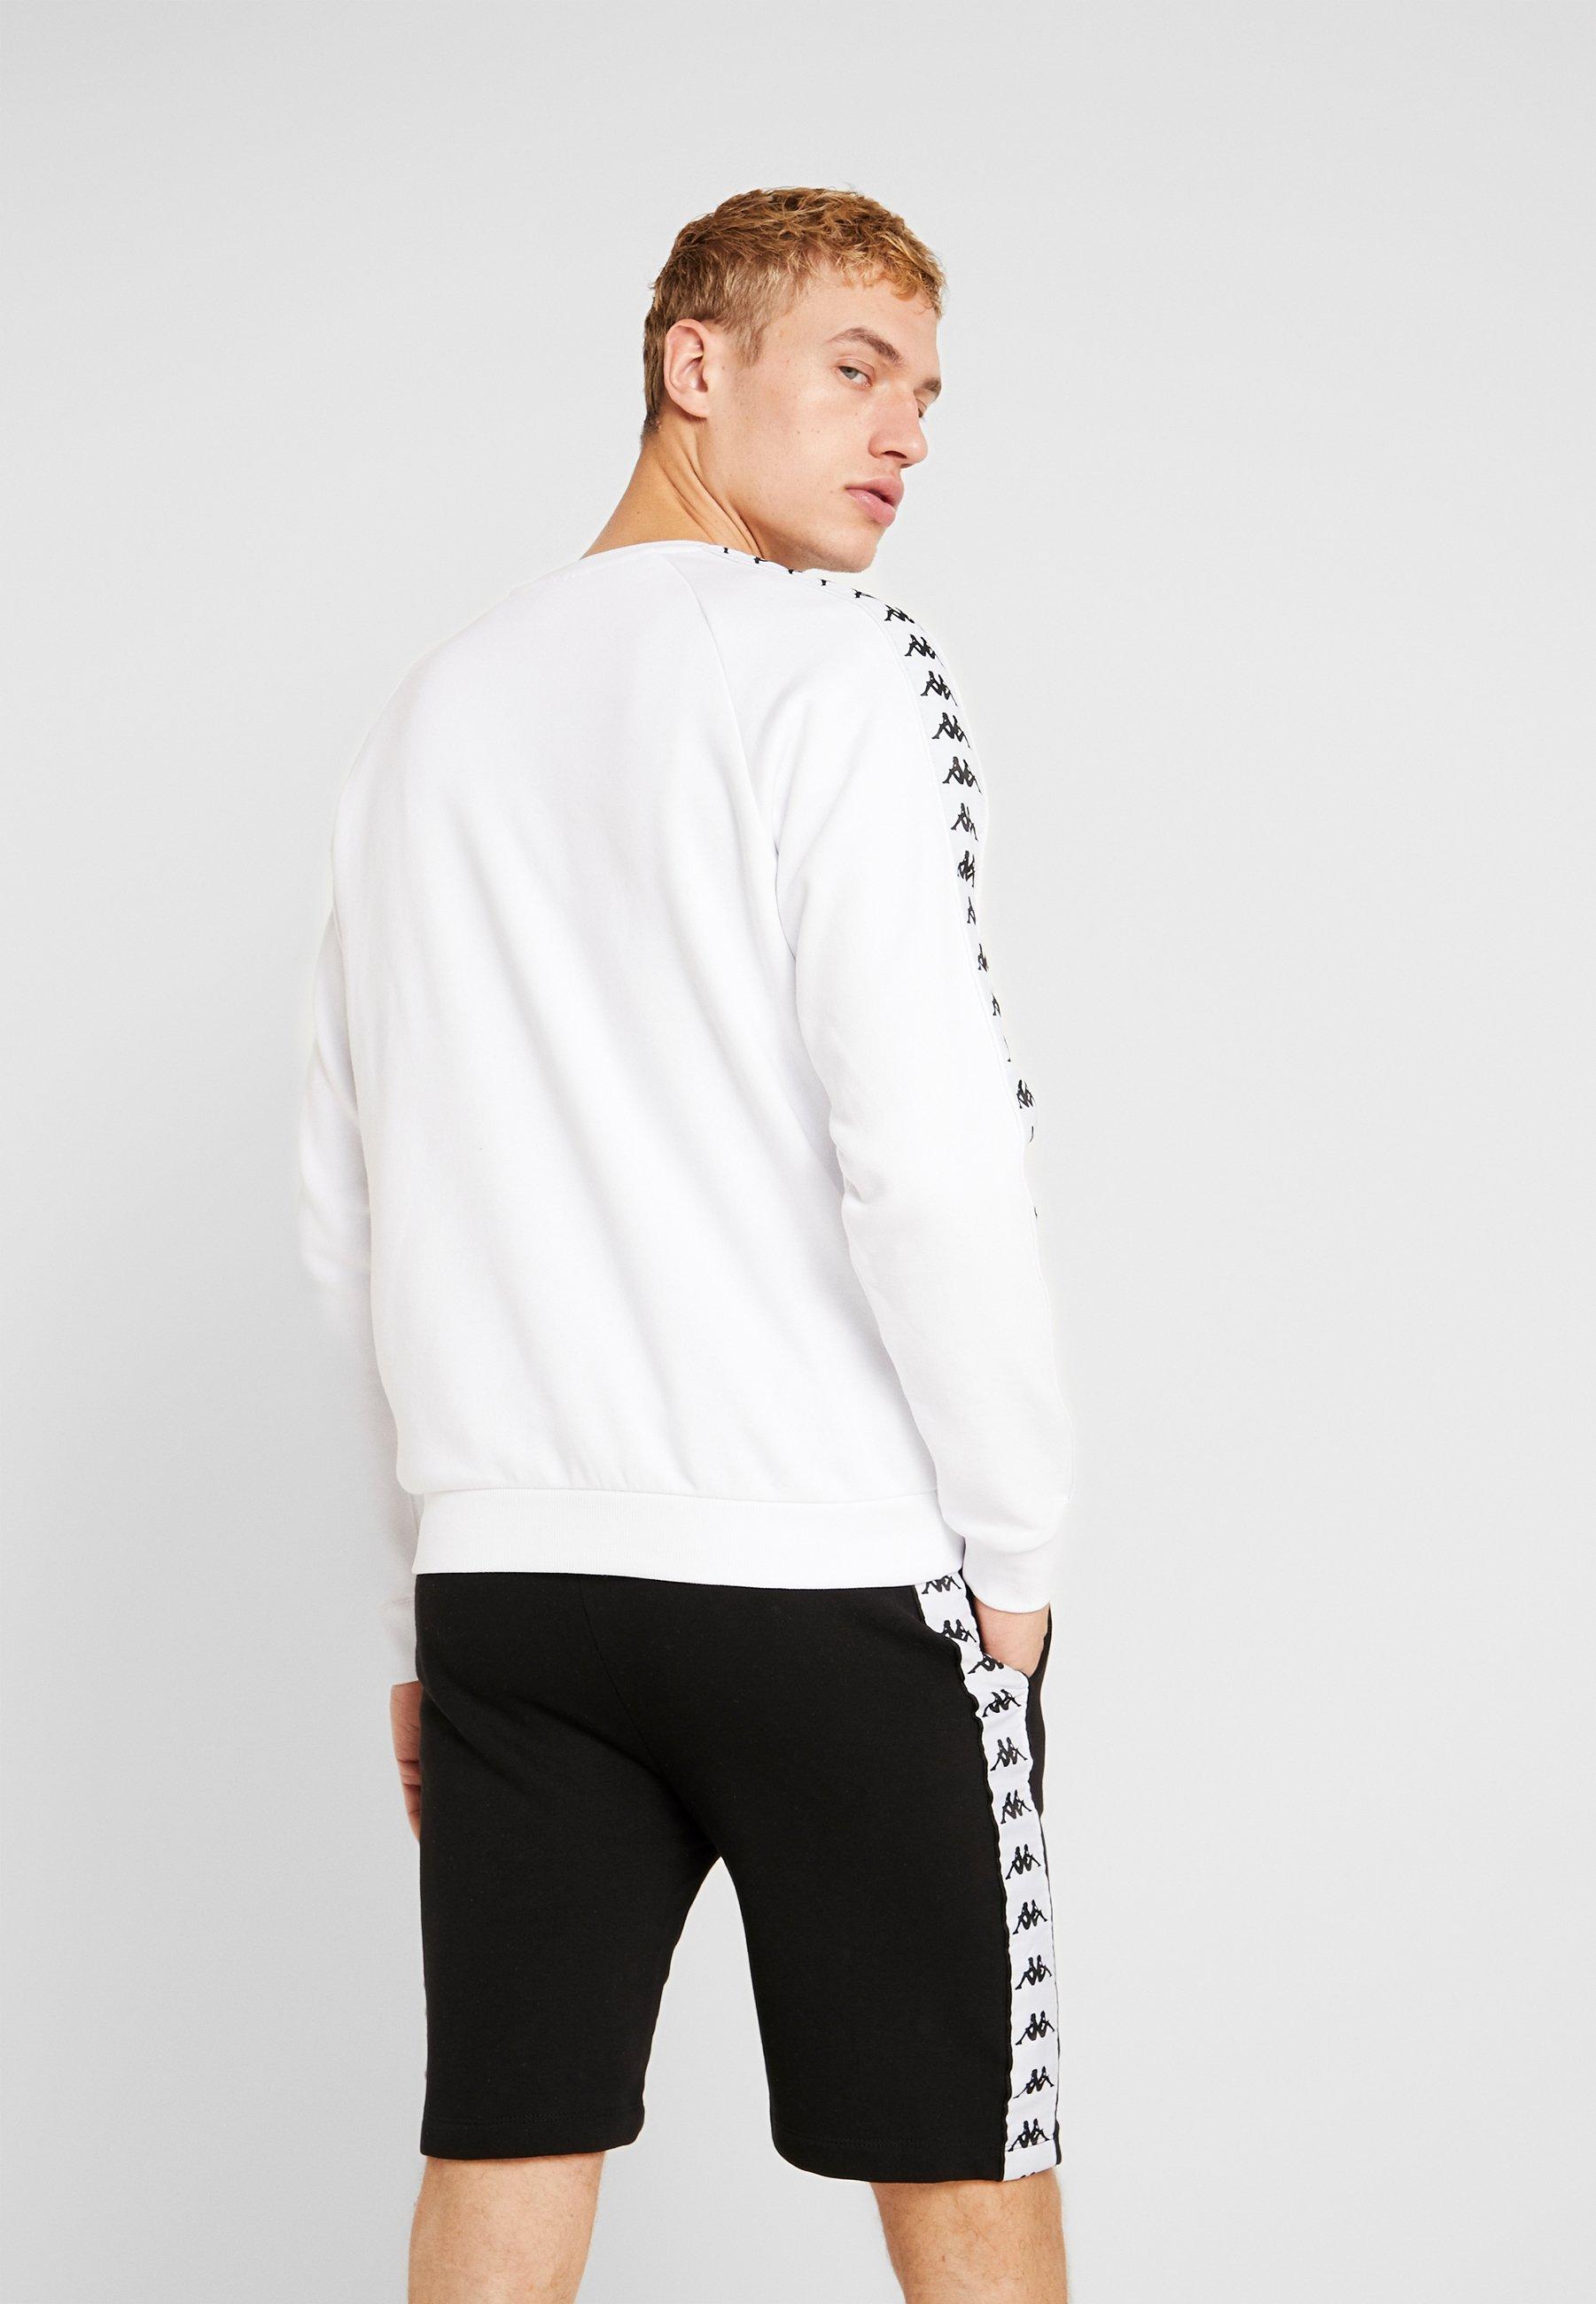 Kappa GOLOR Sweatshirt bright white ZALANDO.FR